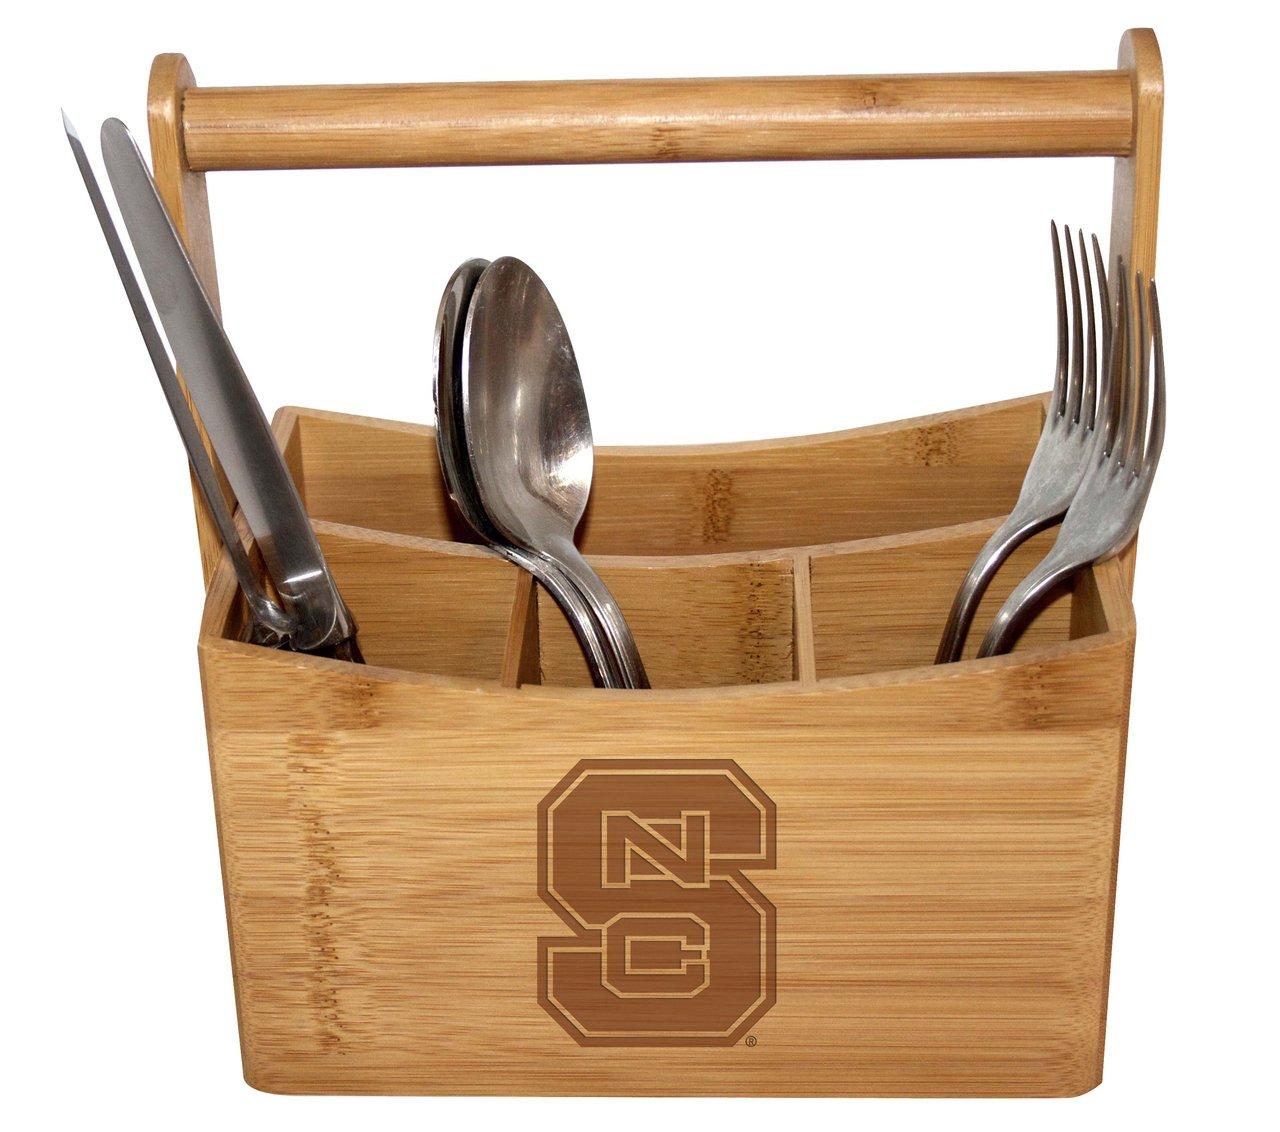 North Carolina State Bamboo Caddy